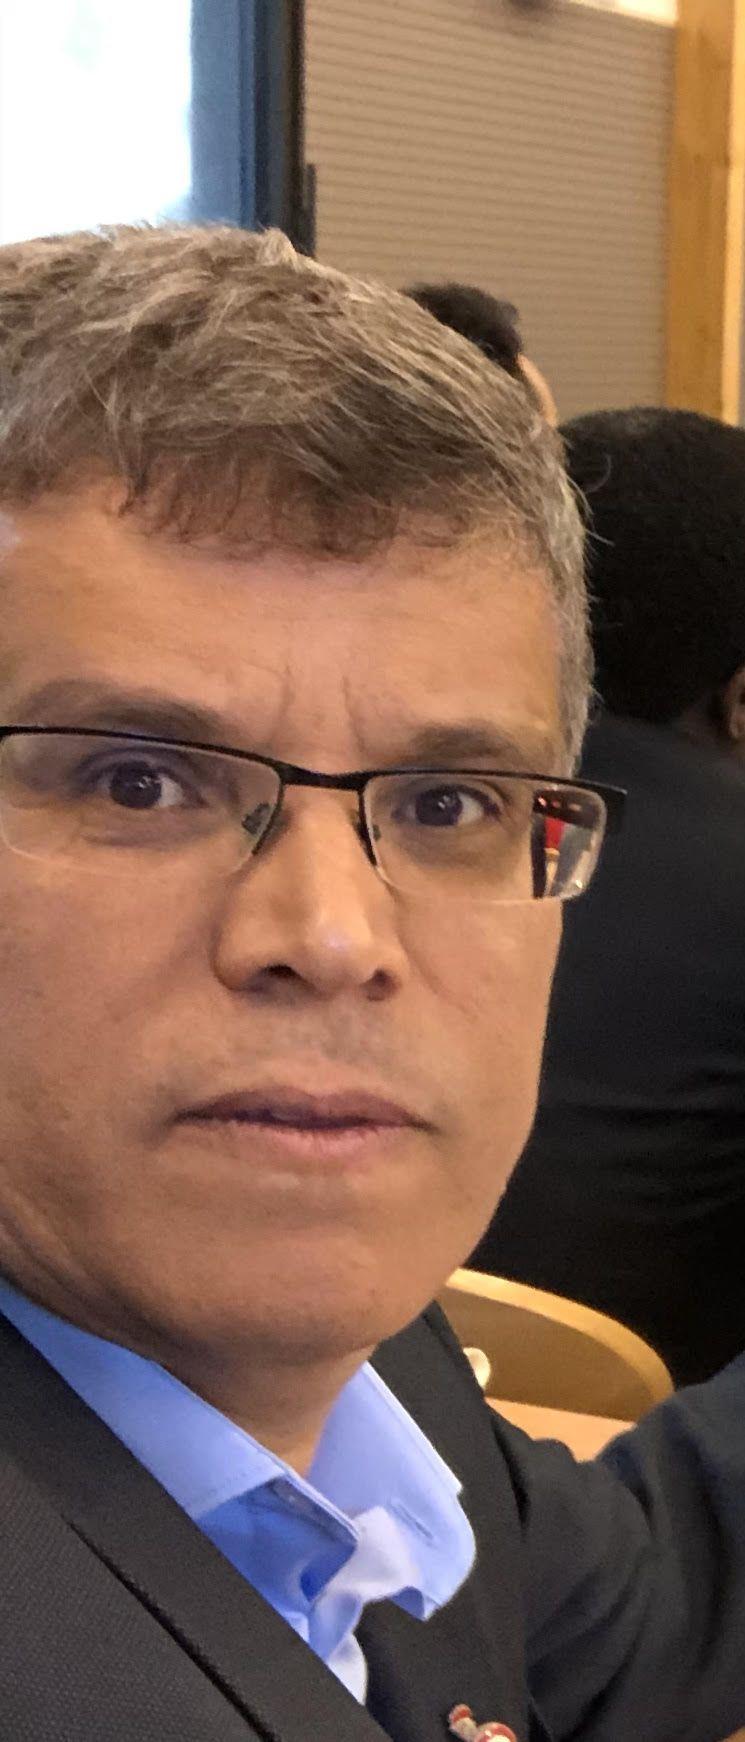 Abdel Bensaid